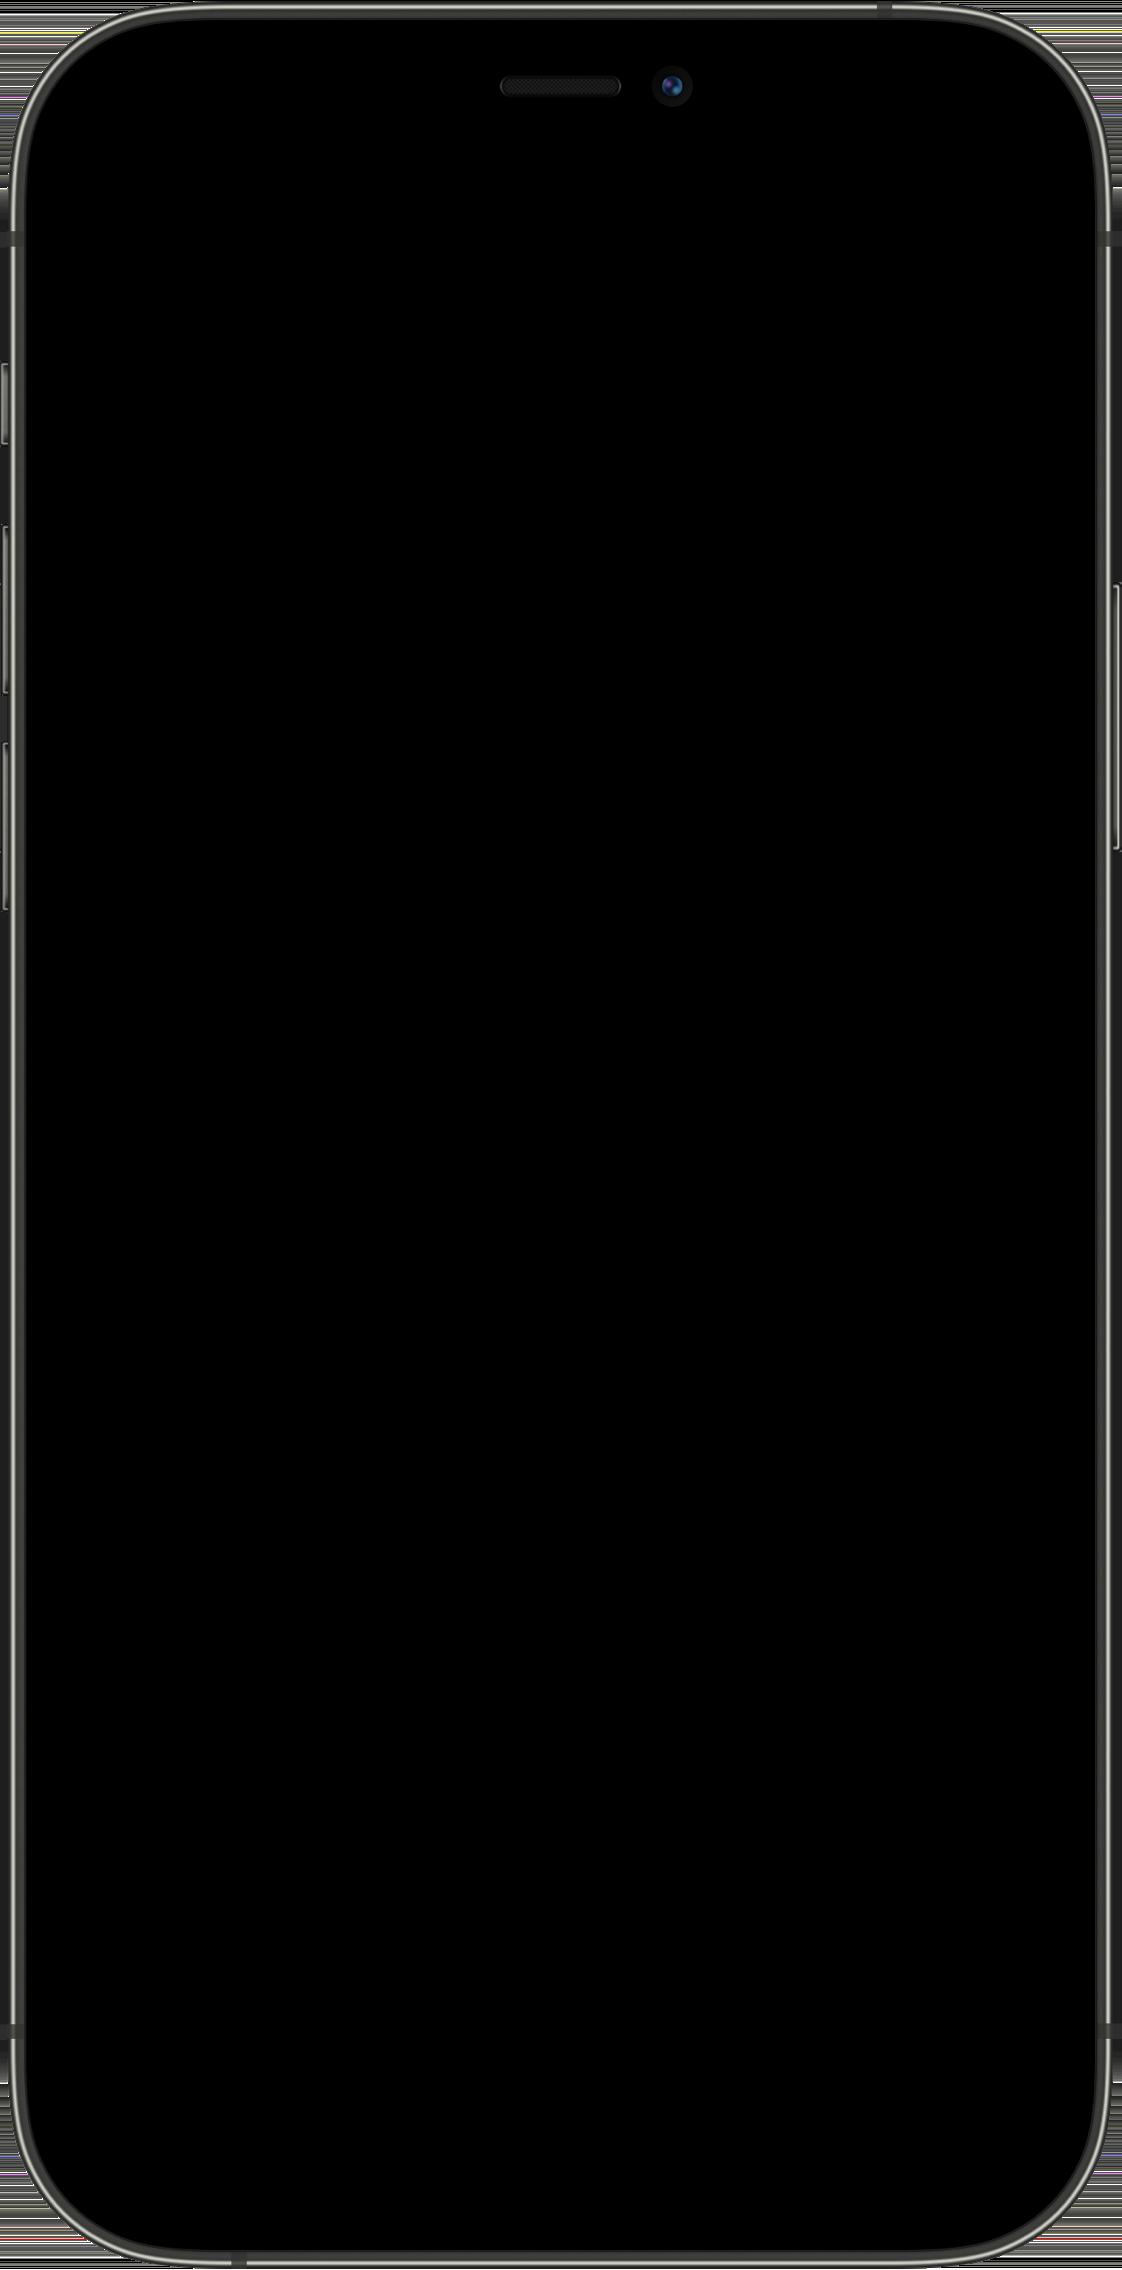 Fan of Sleep iOS Device